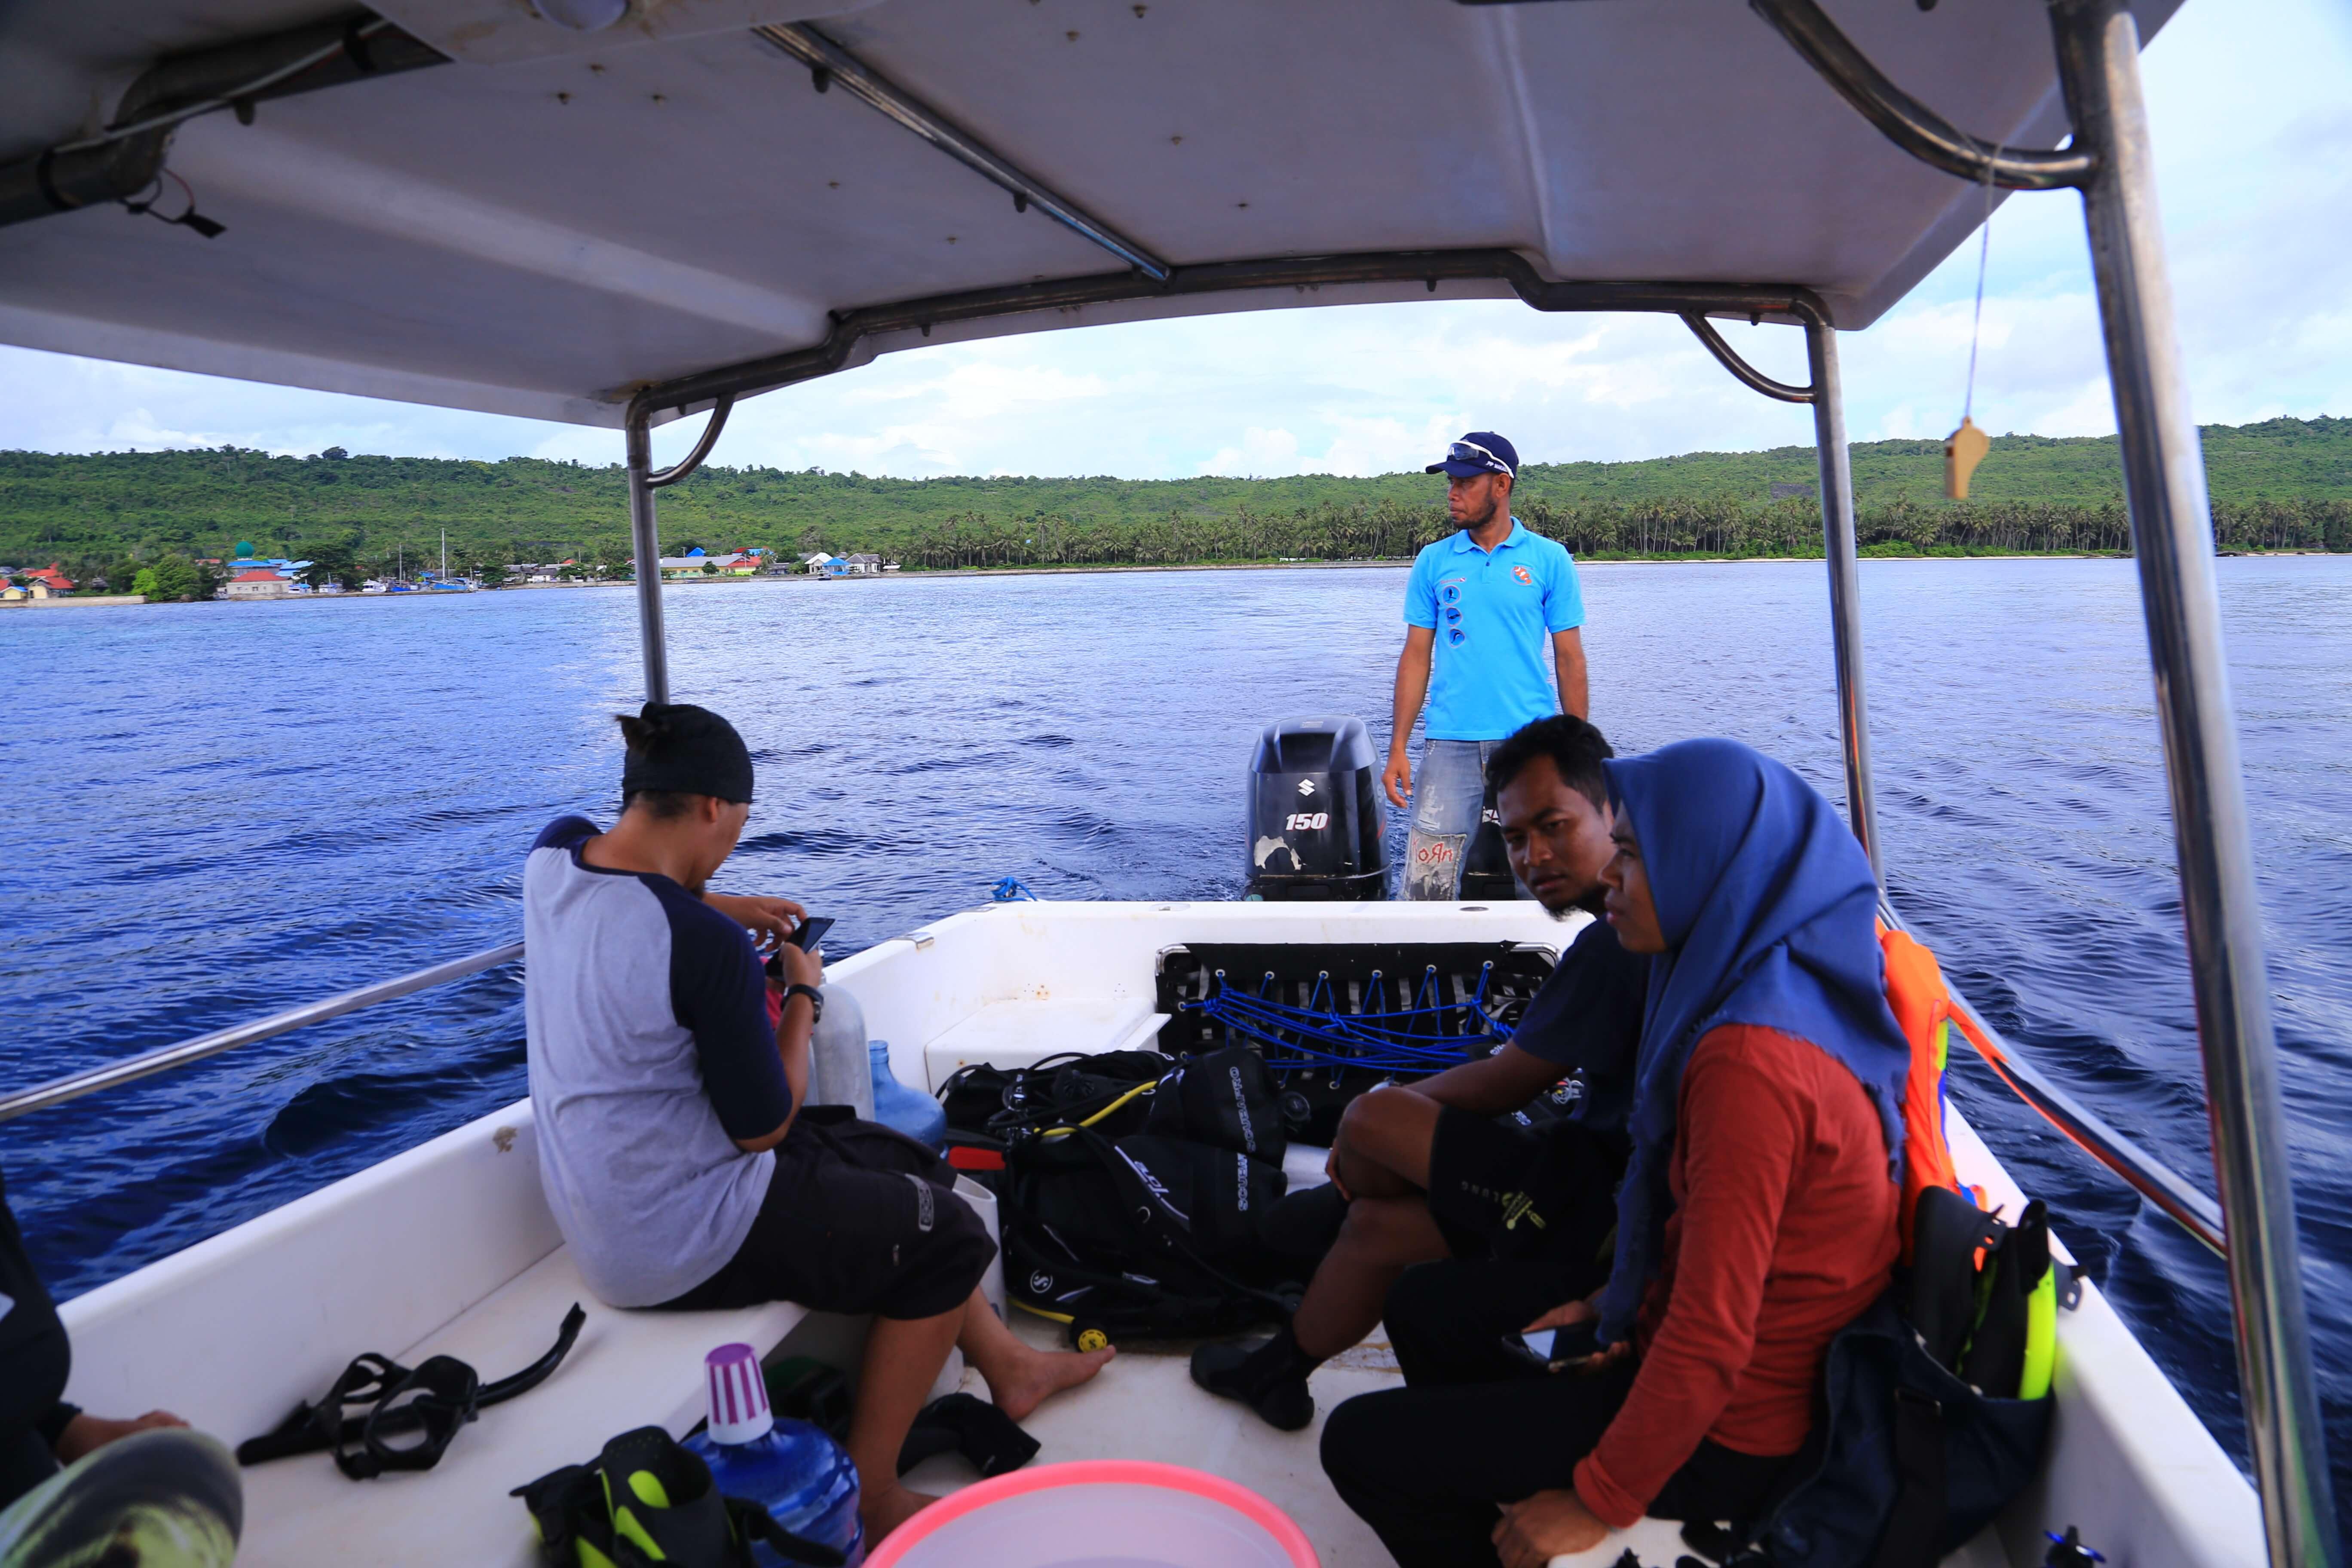 Menuju titik penyelaman pulau Binongko/Widhibek